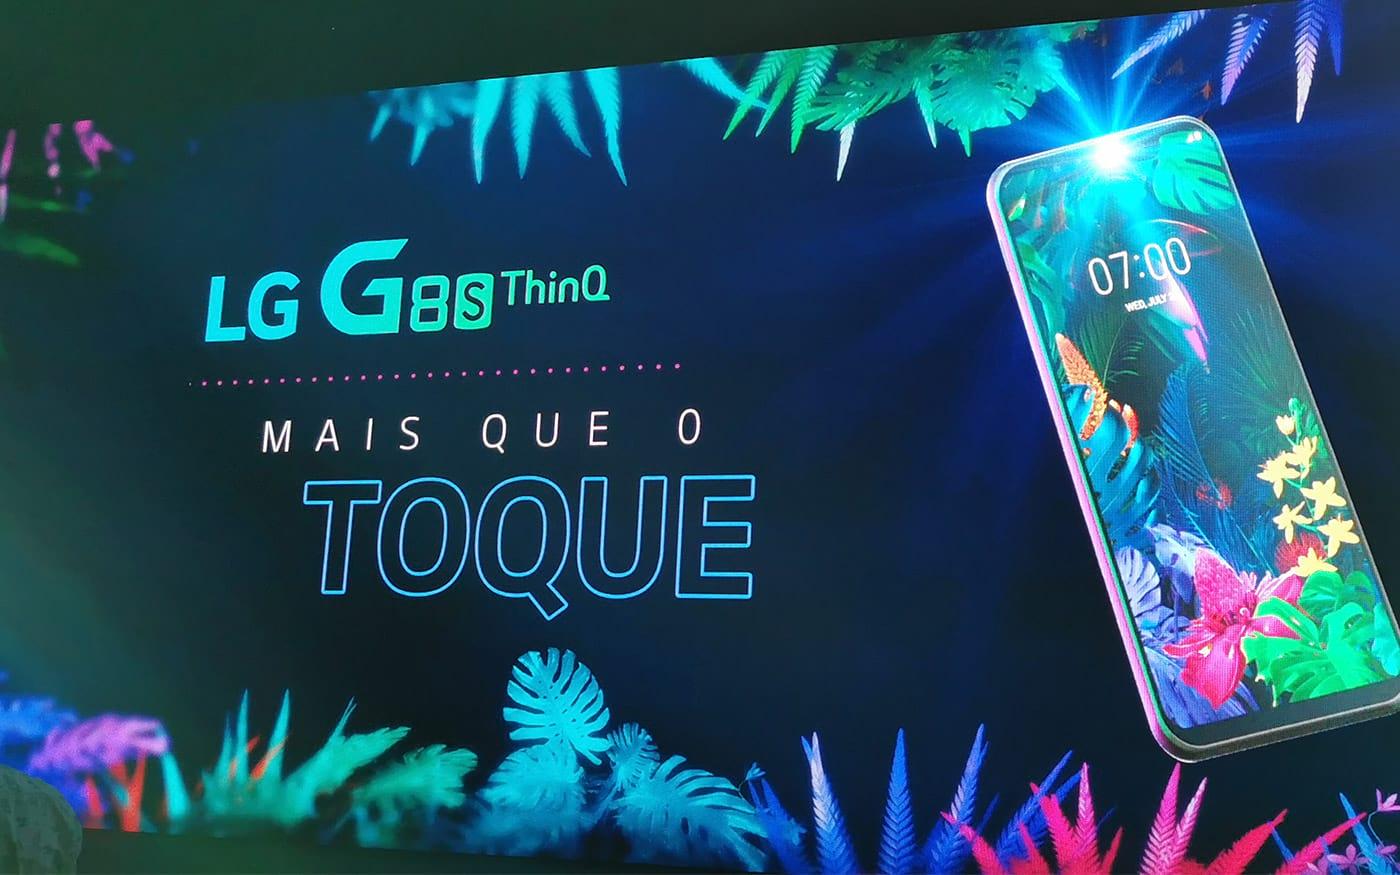 LG anuncia o LG G8s ThinQ no Brasil, por R$ 4.299